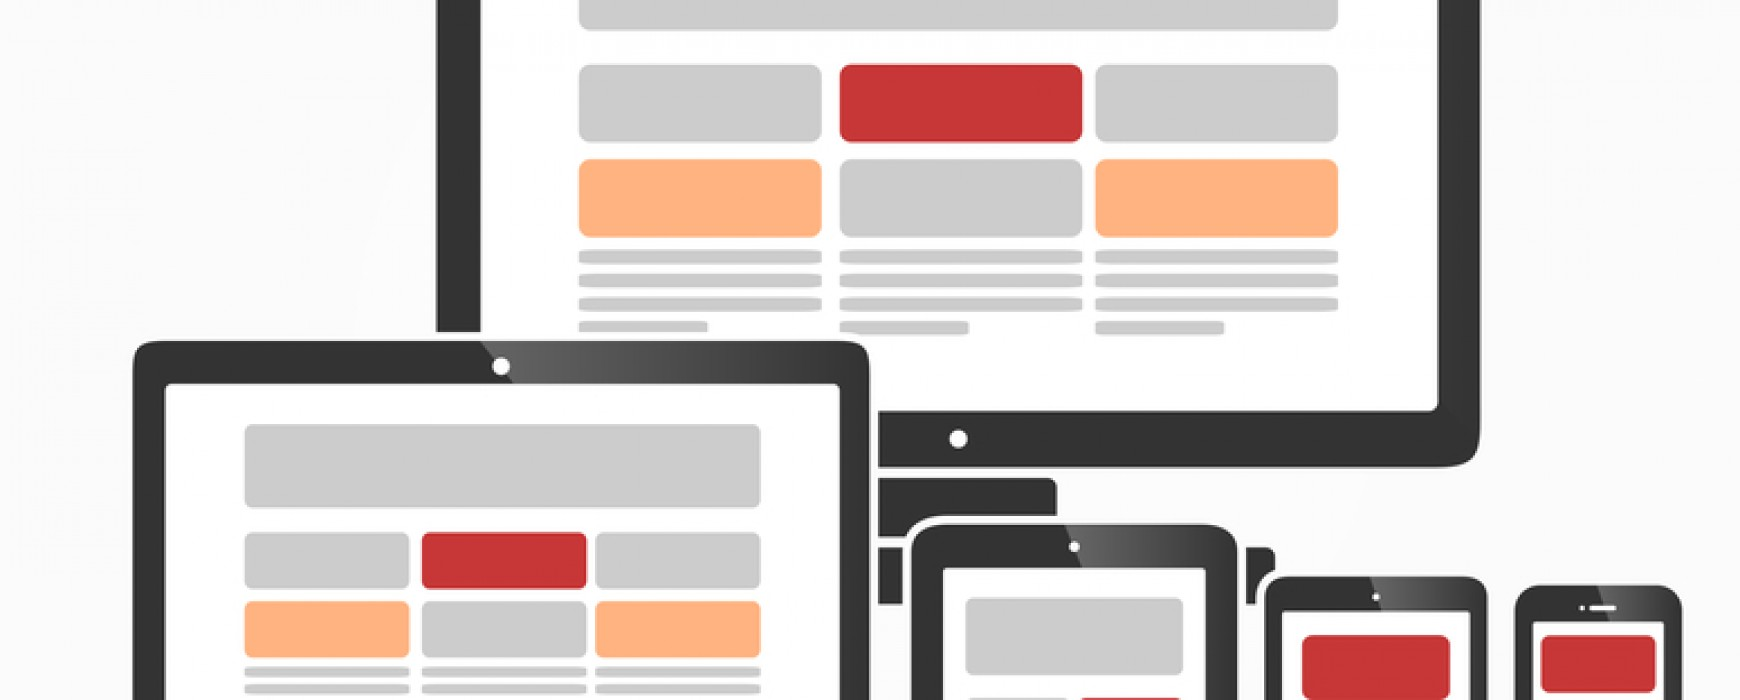 Responsive Webdesign in Onlineshops